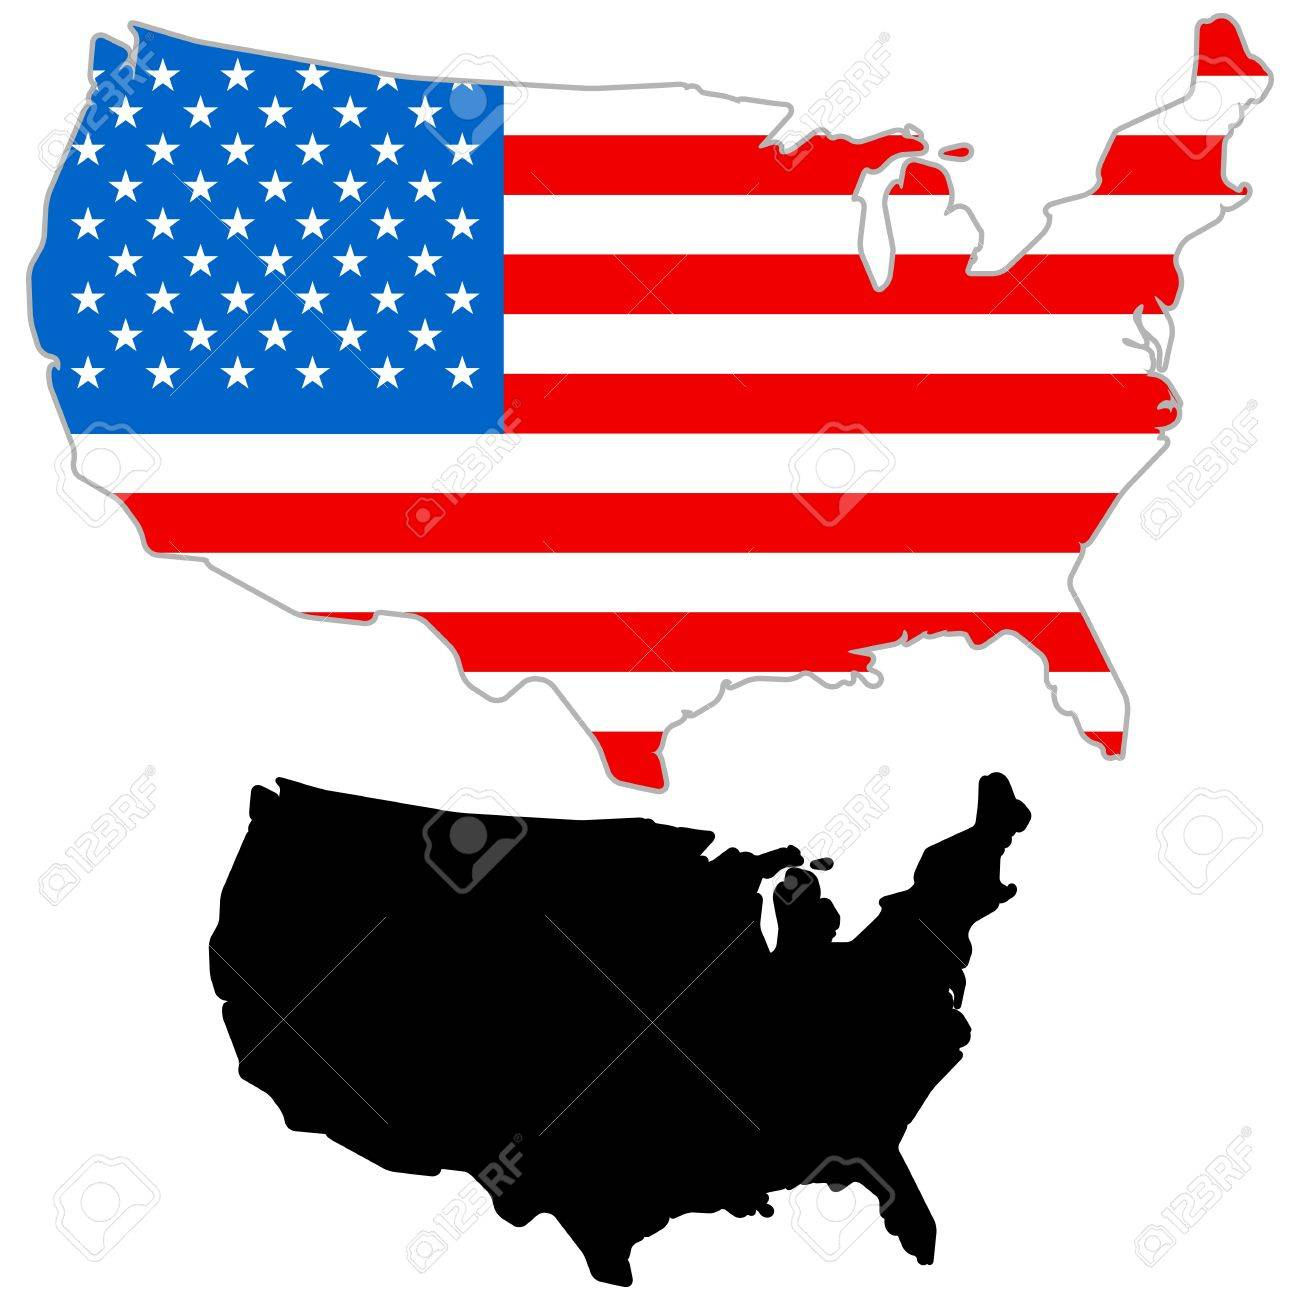 US Maps USA State Maps US Maps USA State Maps US Maps USA State - United states map vector free ai